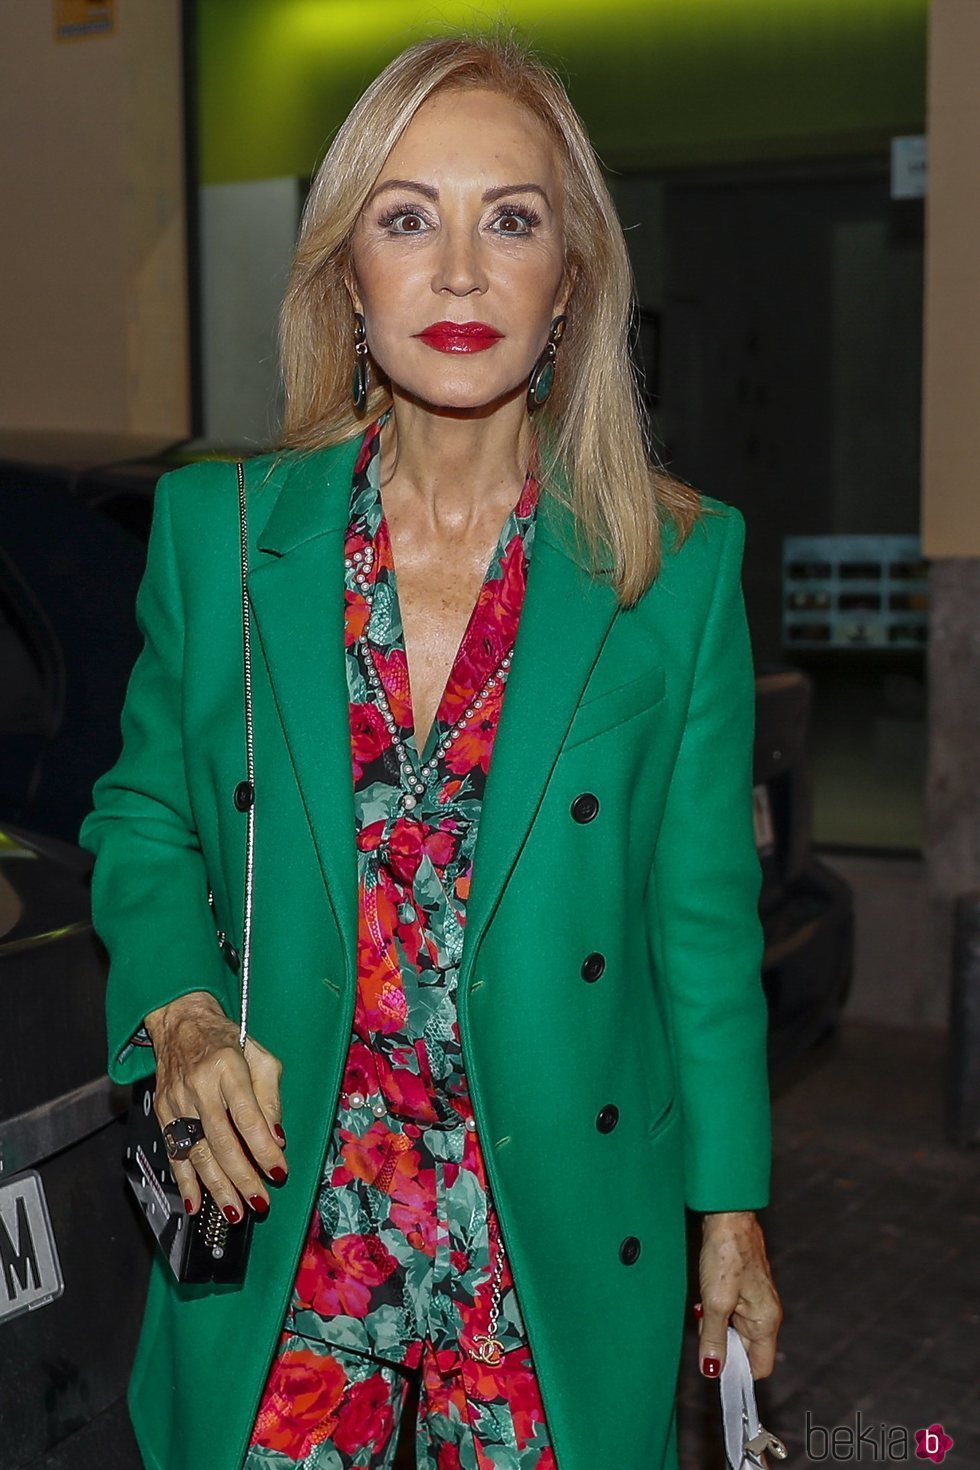 Carmen Lomana en la fiesta de 50 cumpleaños de Eugenia Martínez de Irujo